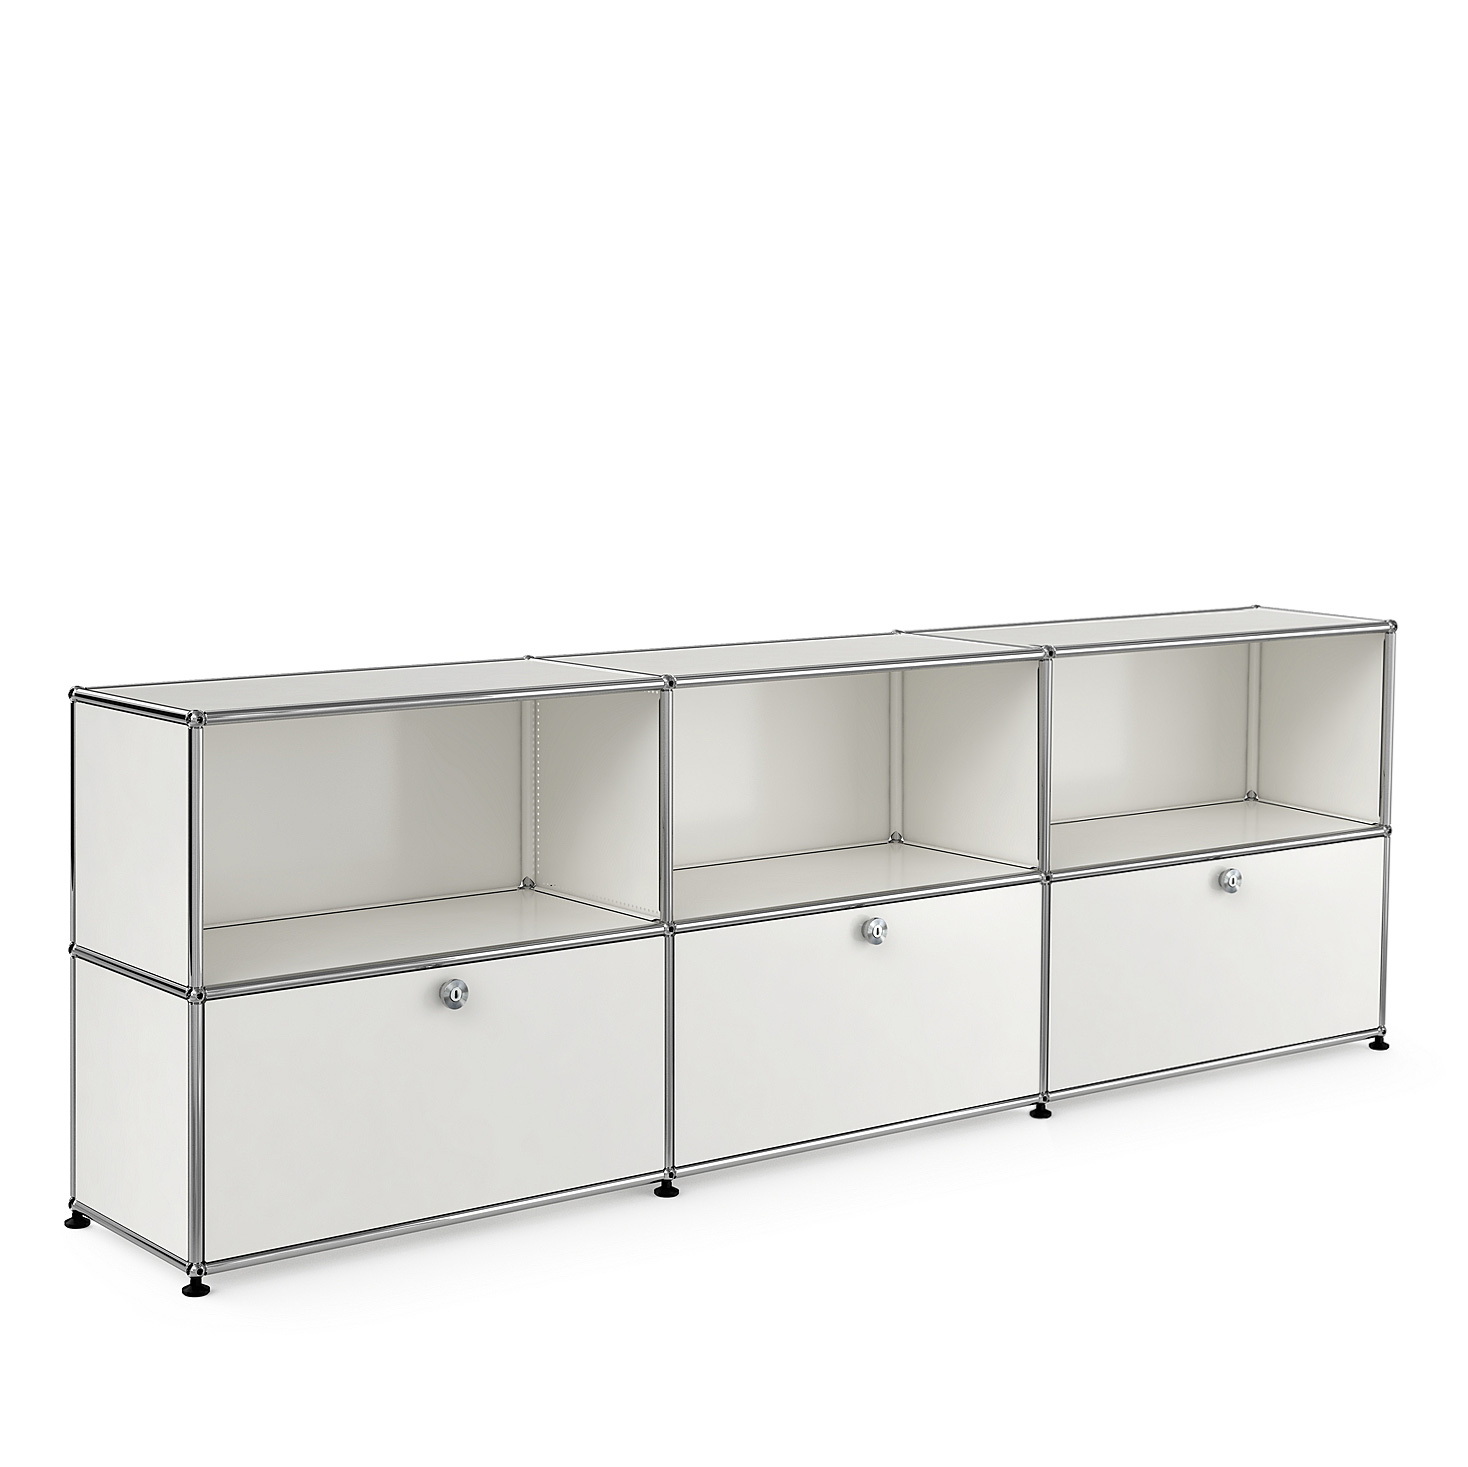 usm haller sideboard 3x2 with three extension doors. Black Bedroom Furniture Sets. Home Design Ideas